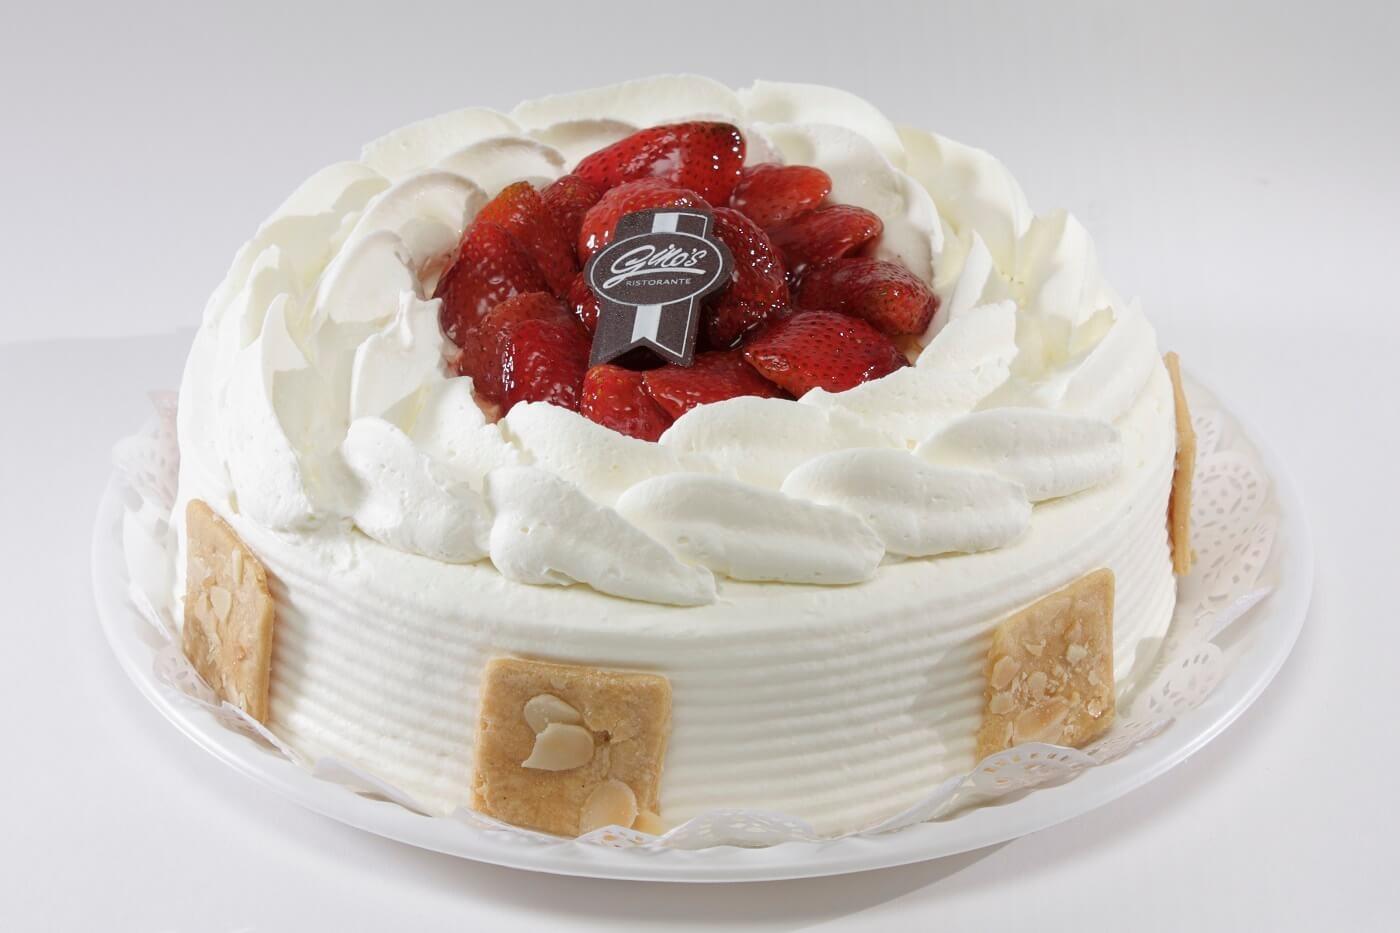 short-cake-ginos-brownie-pasteles-fiestas-bautizos-baby-shower-dulces